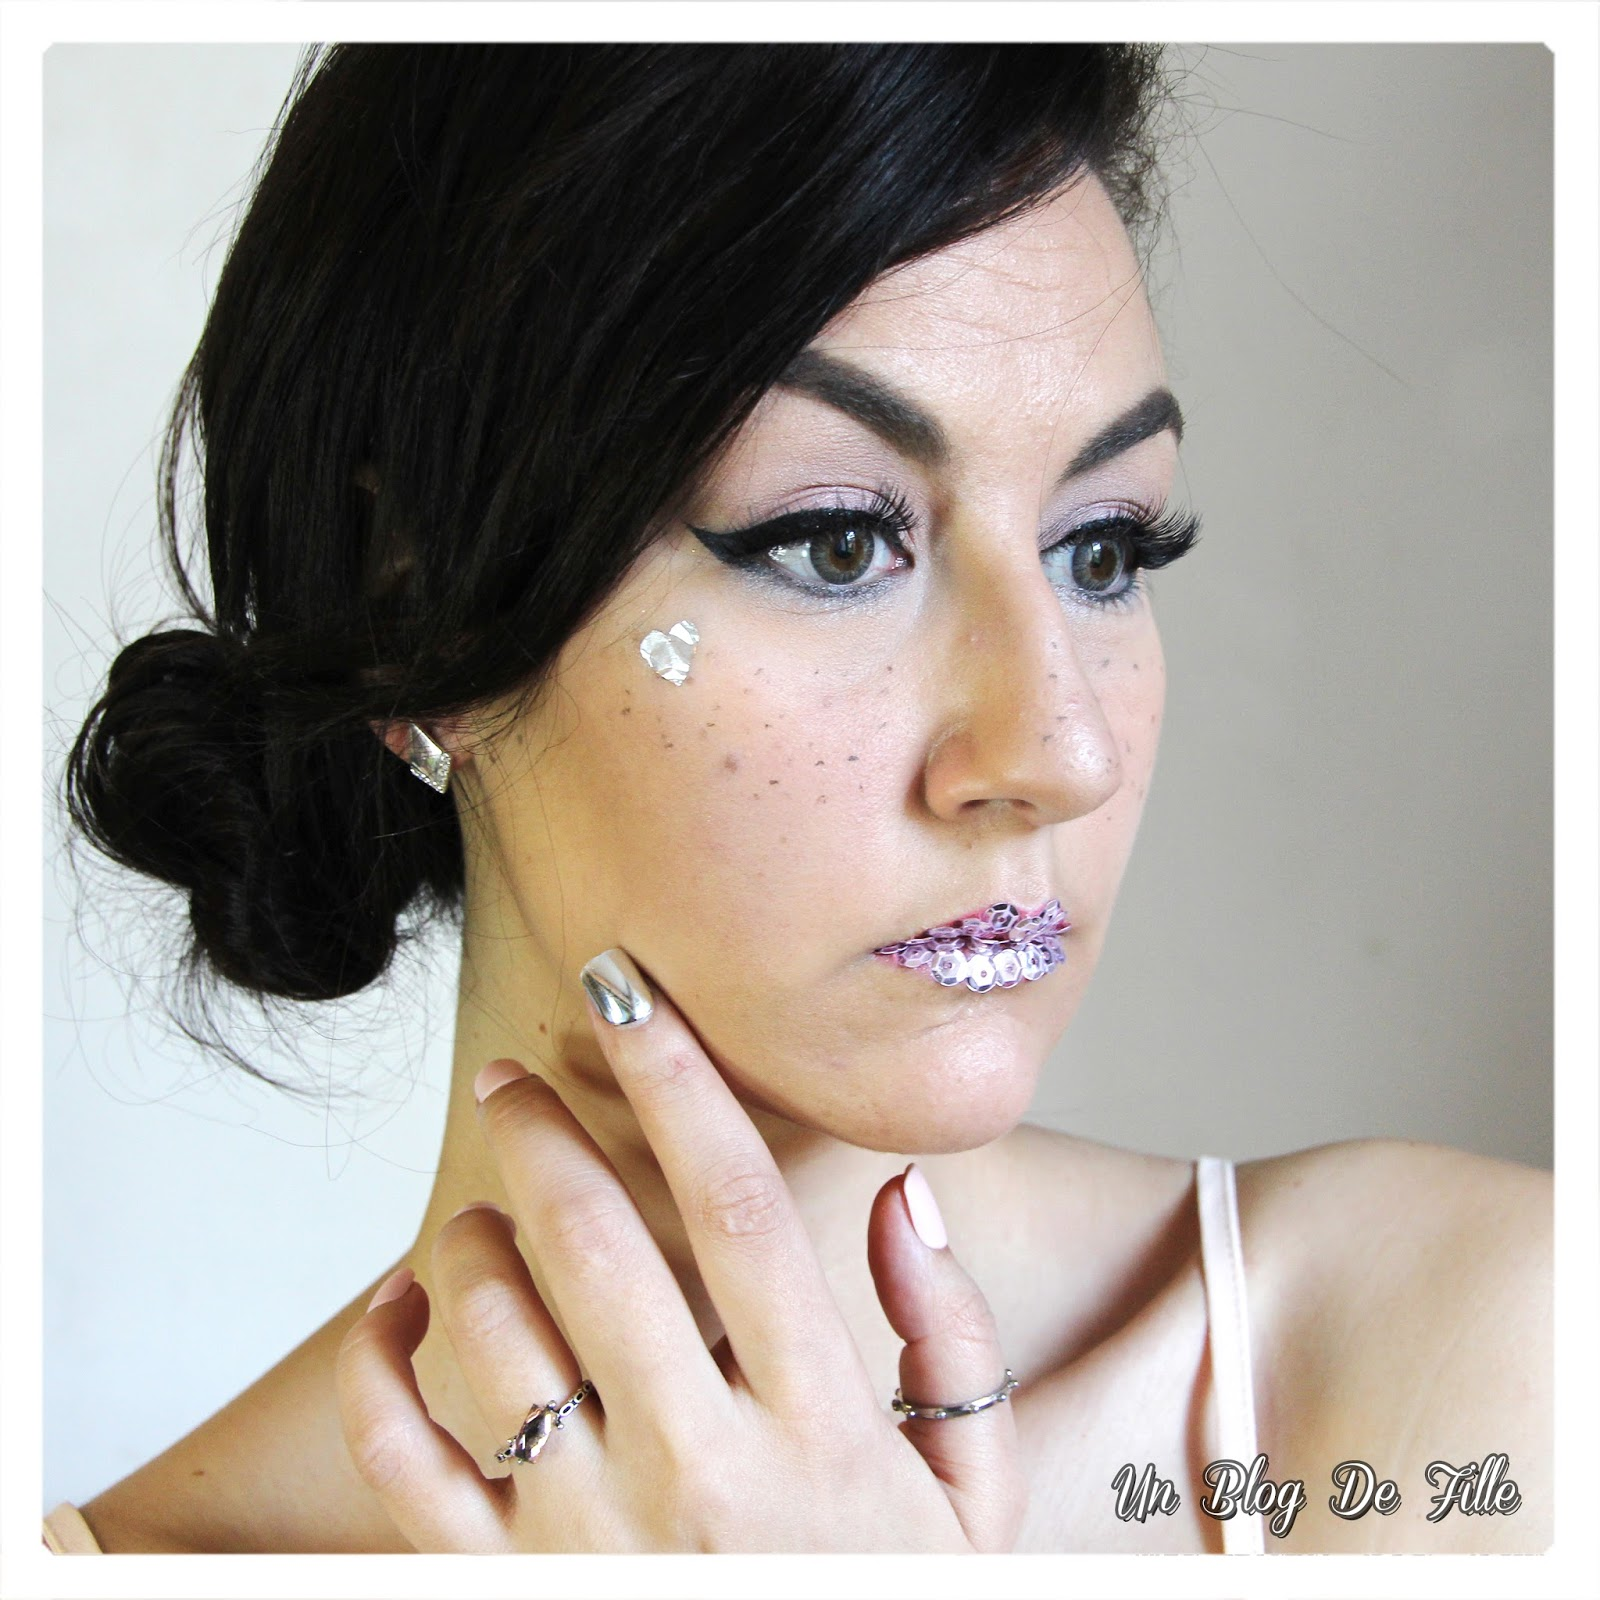 http://unblogdefille.blogspot.fr/2018/02/maquillage-romance-metallique-kiss.html